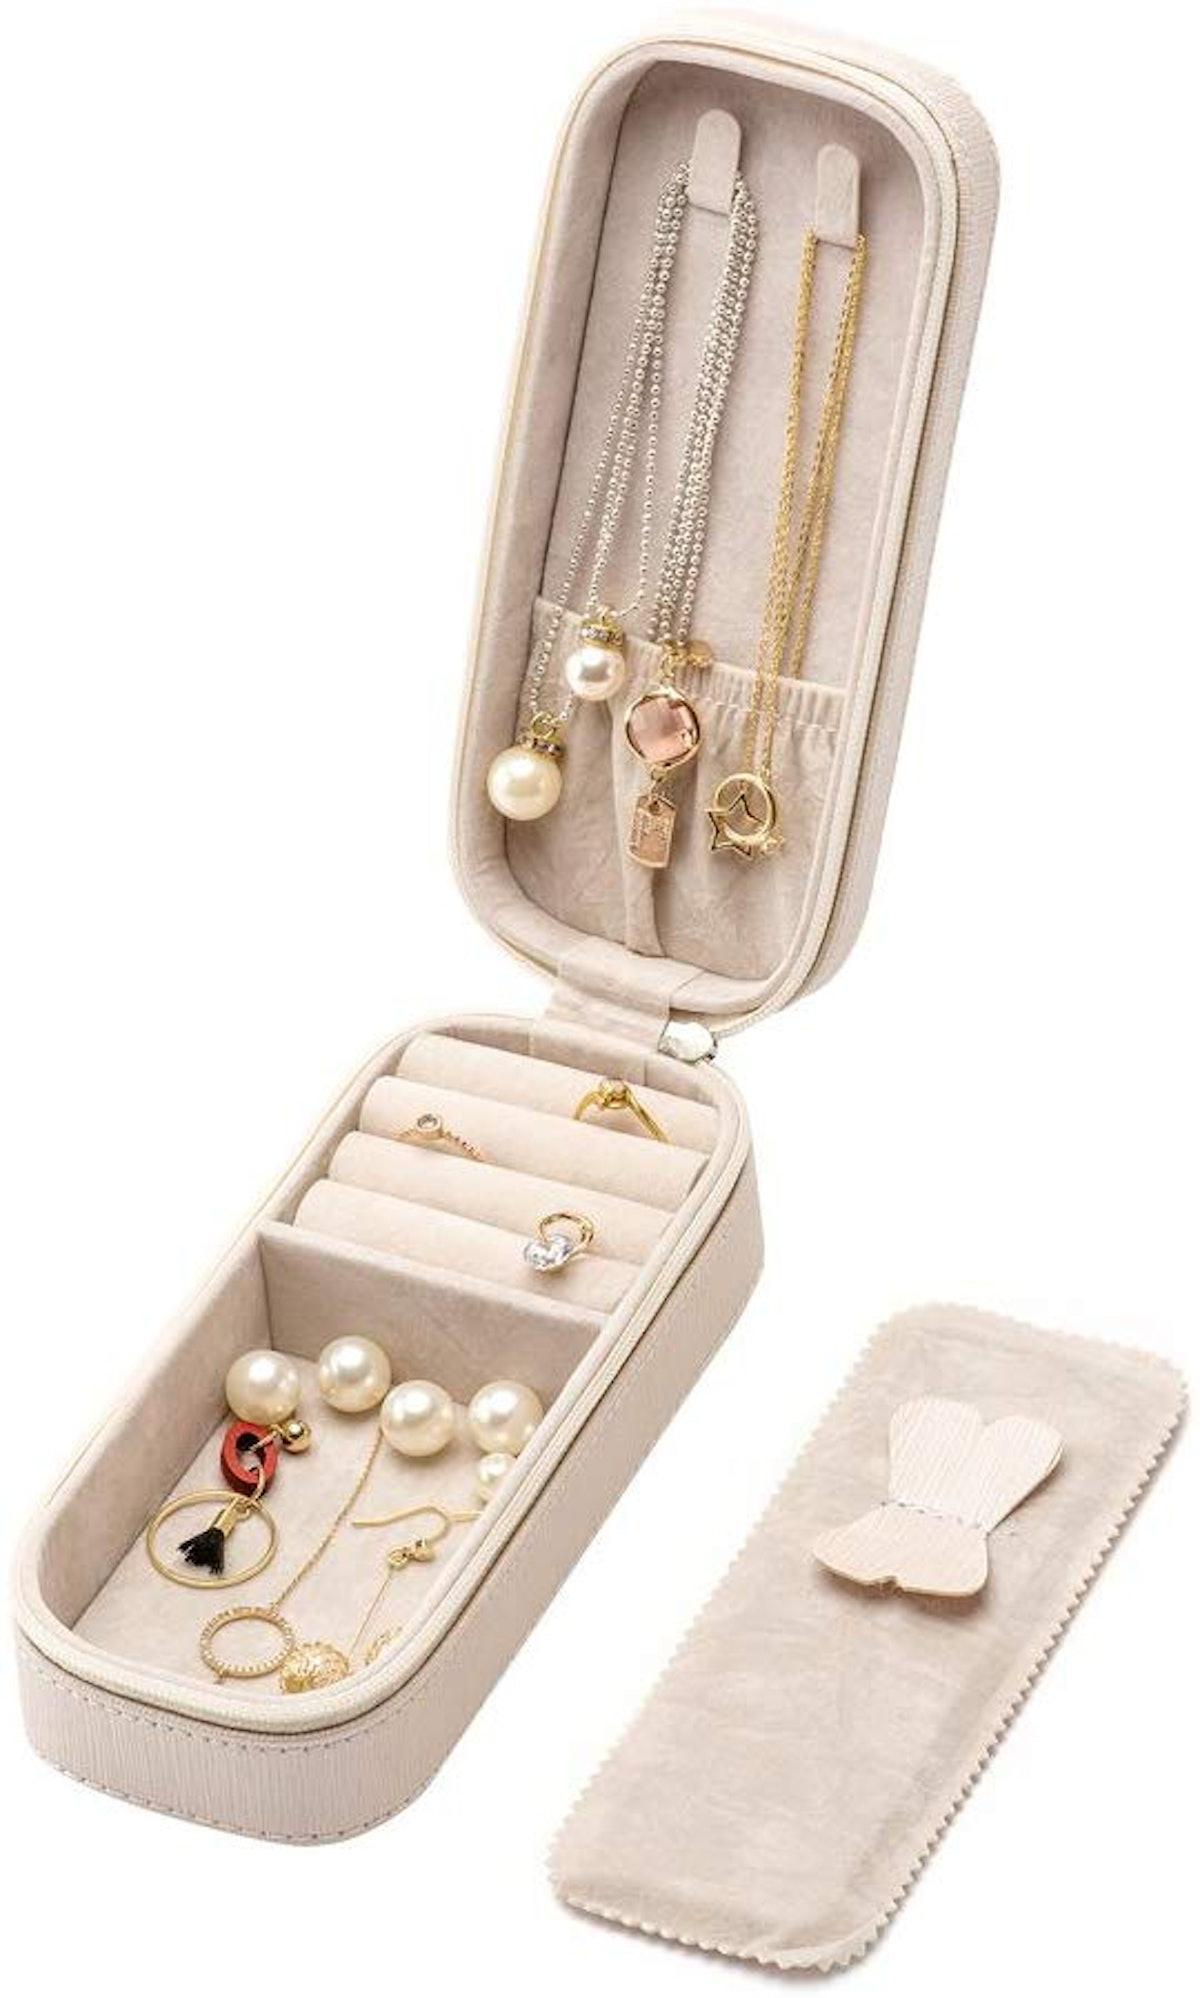 SANQIANWAN Small Jewelry Travel Organizer